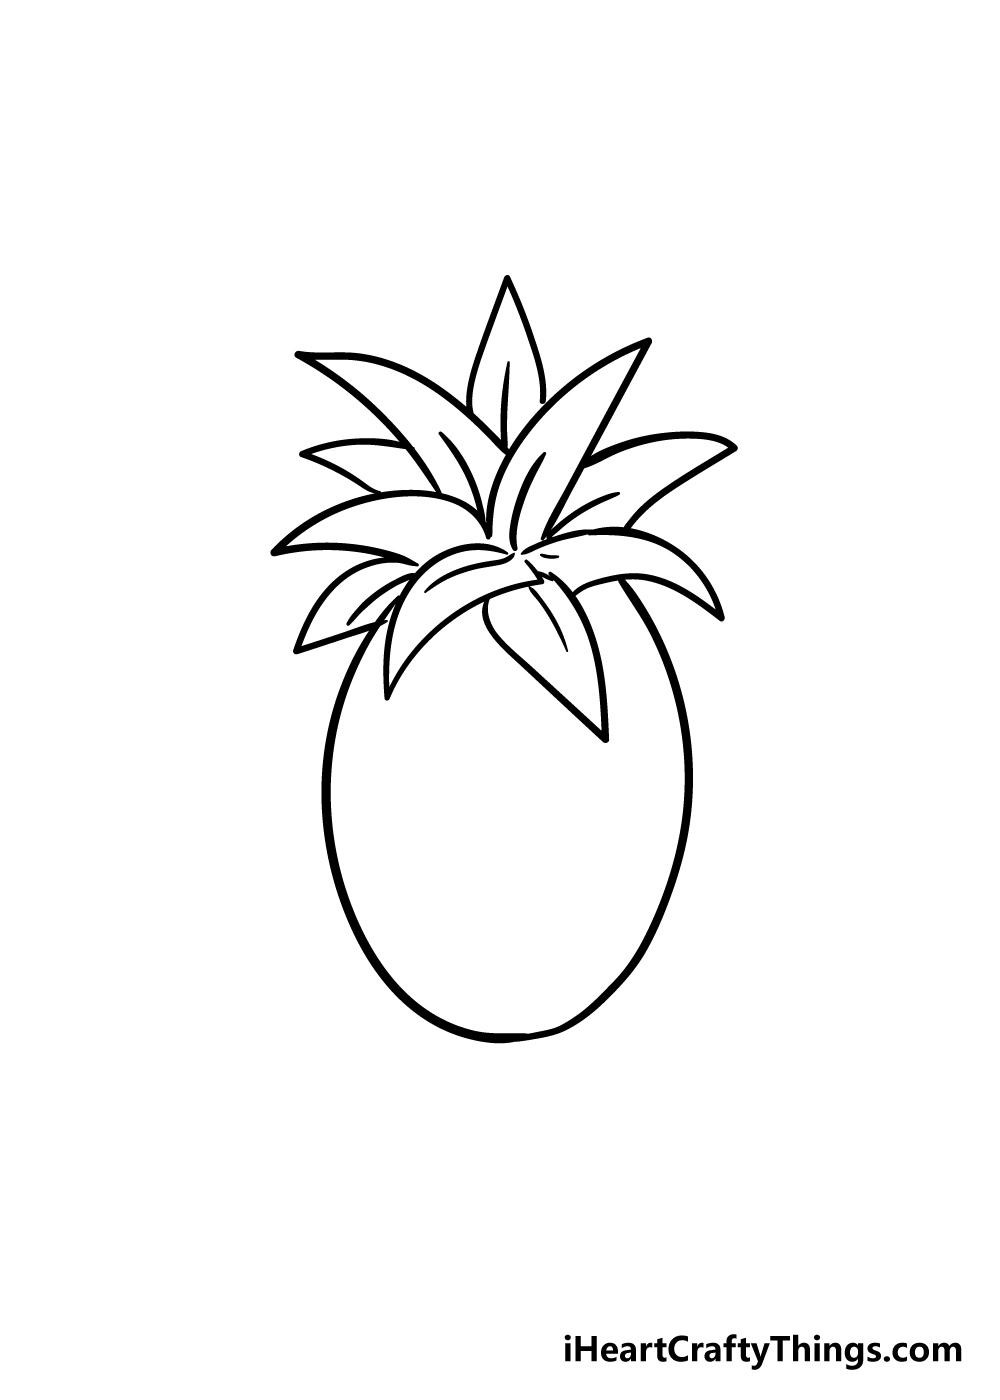 pineapple drawing step 6